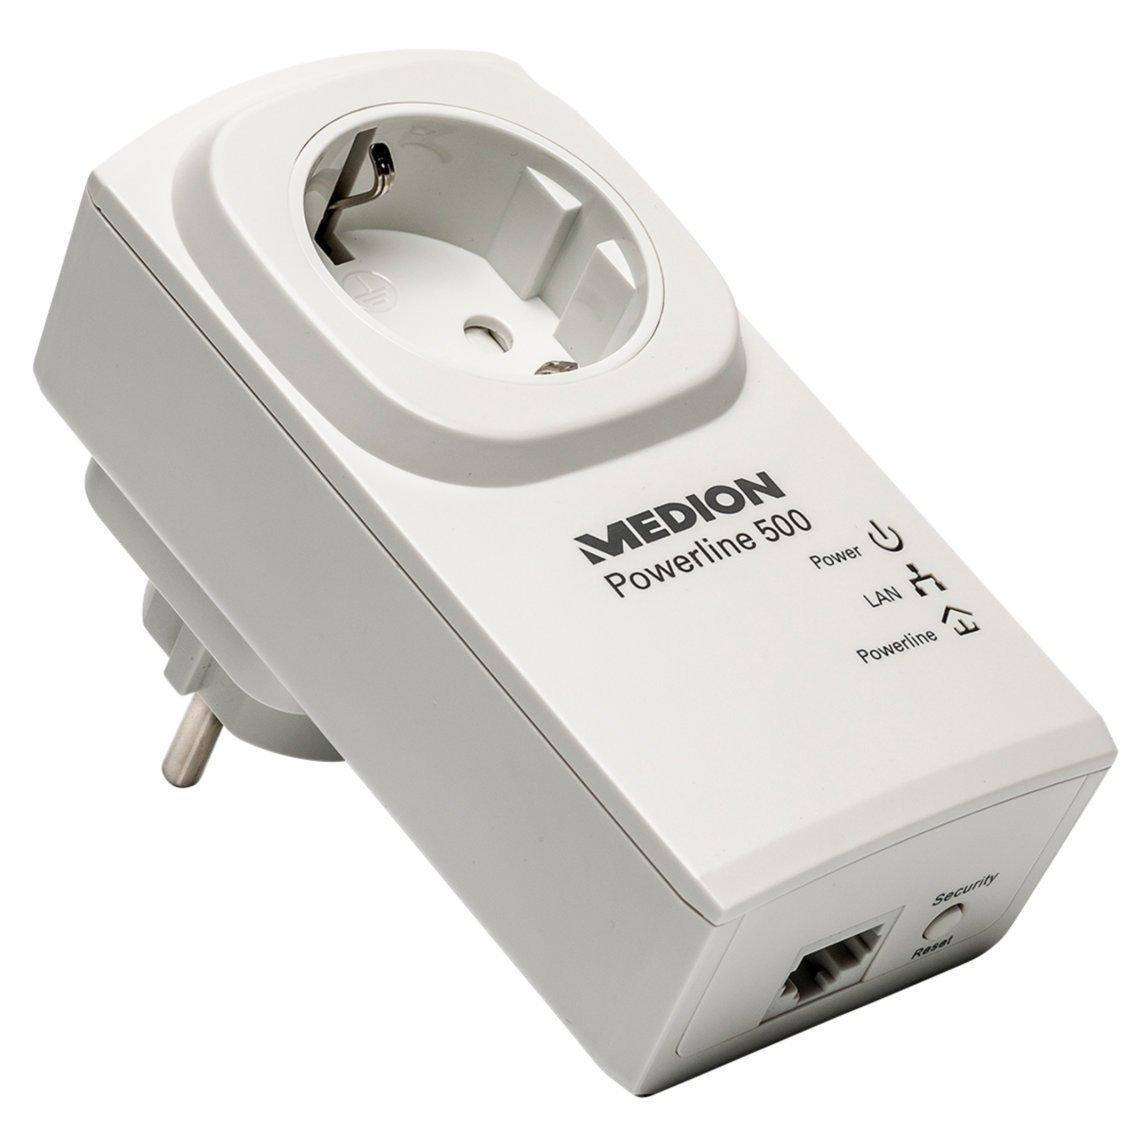 "Medion™ - 500 Mbit/s Powerline Adapter ""P85049 (MD87309)"" (integrierte Steckdose) ab €16,38 [@Medion.de]"